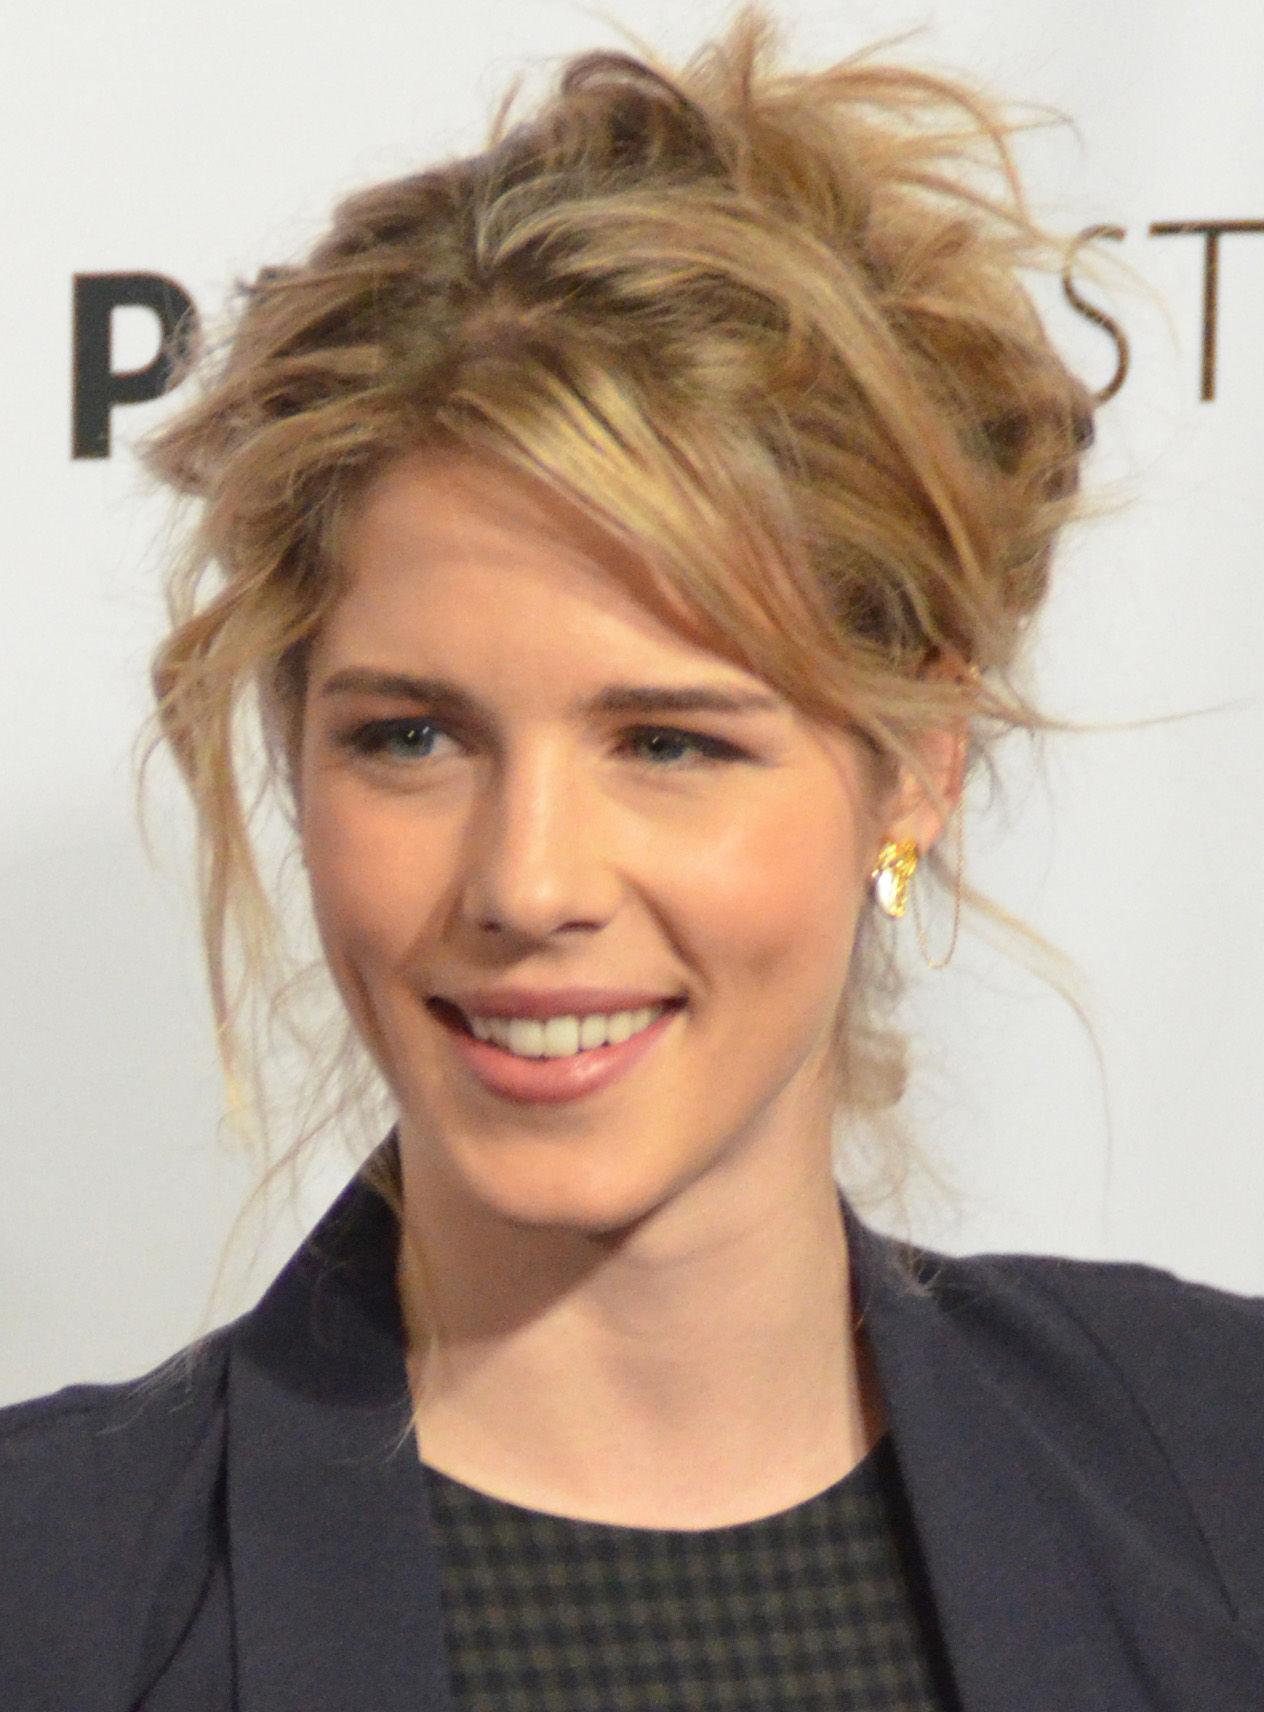 Photo of Emily Bett Rickards: Canadian actress